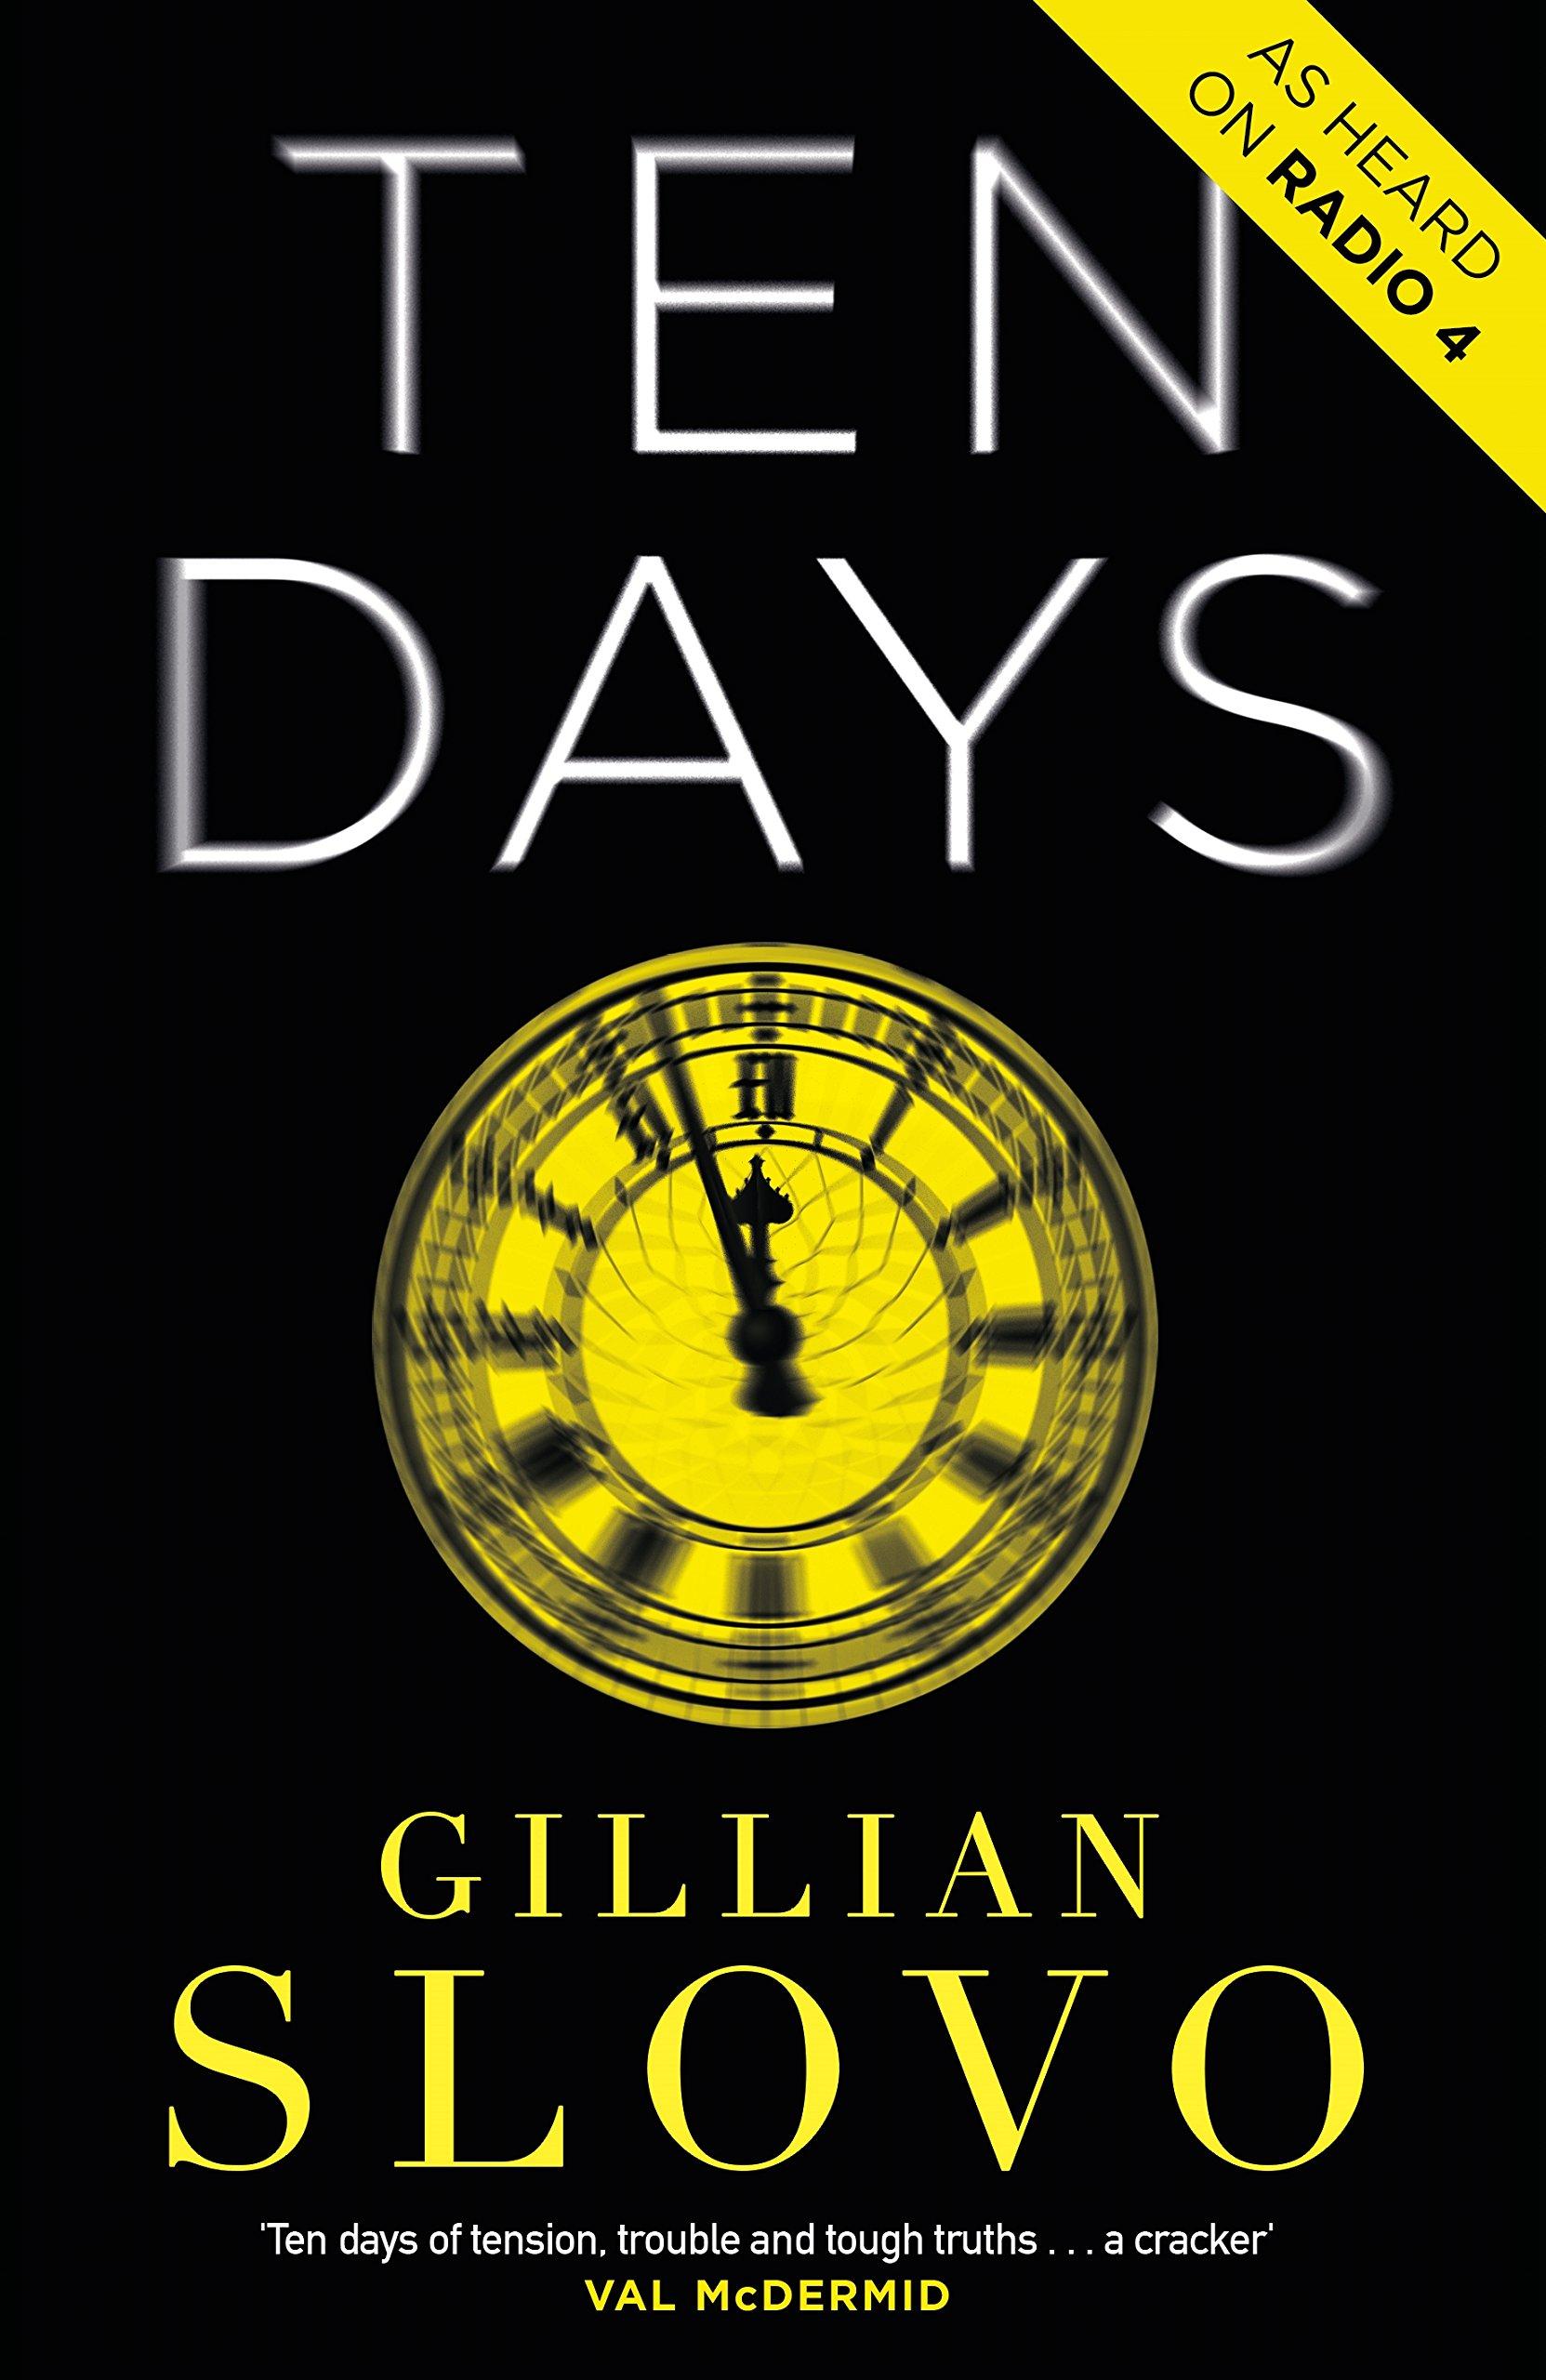 Ten Days Gillian Slovo Cityread London